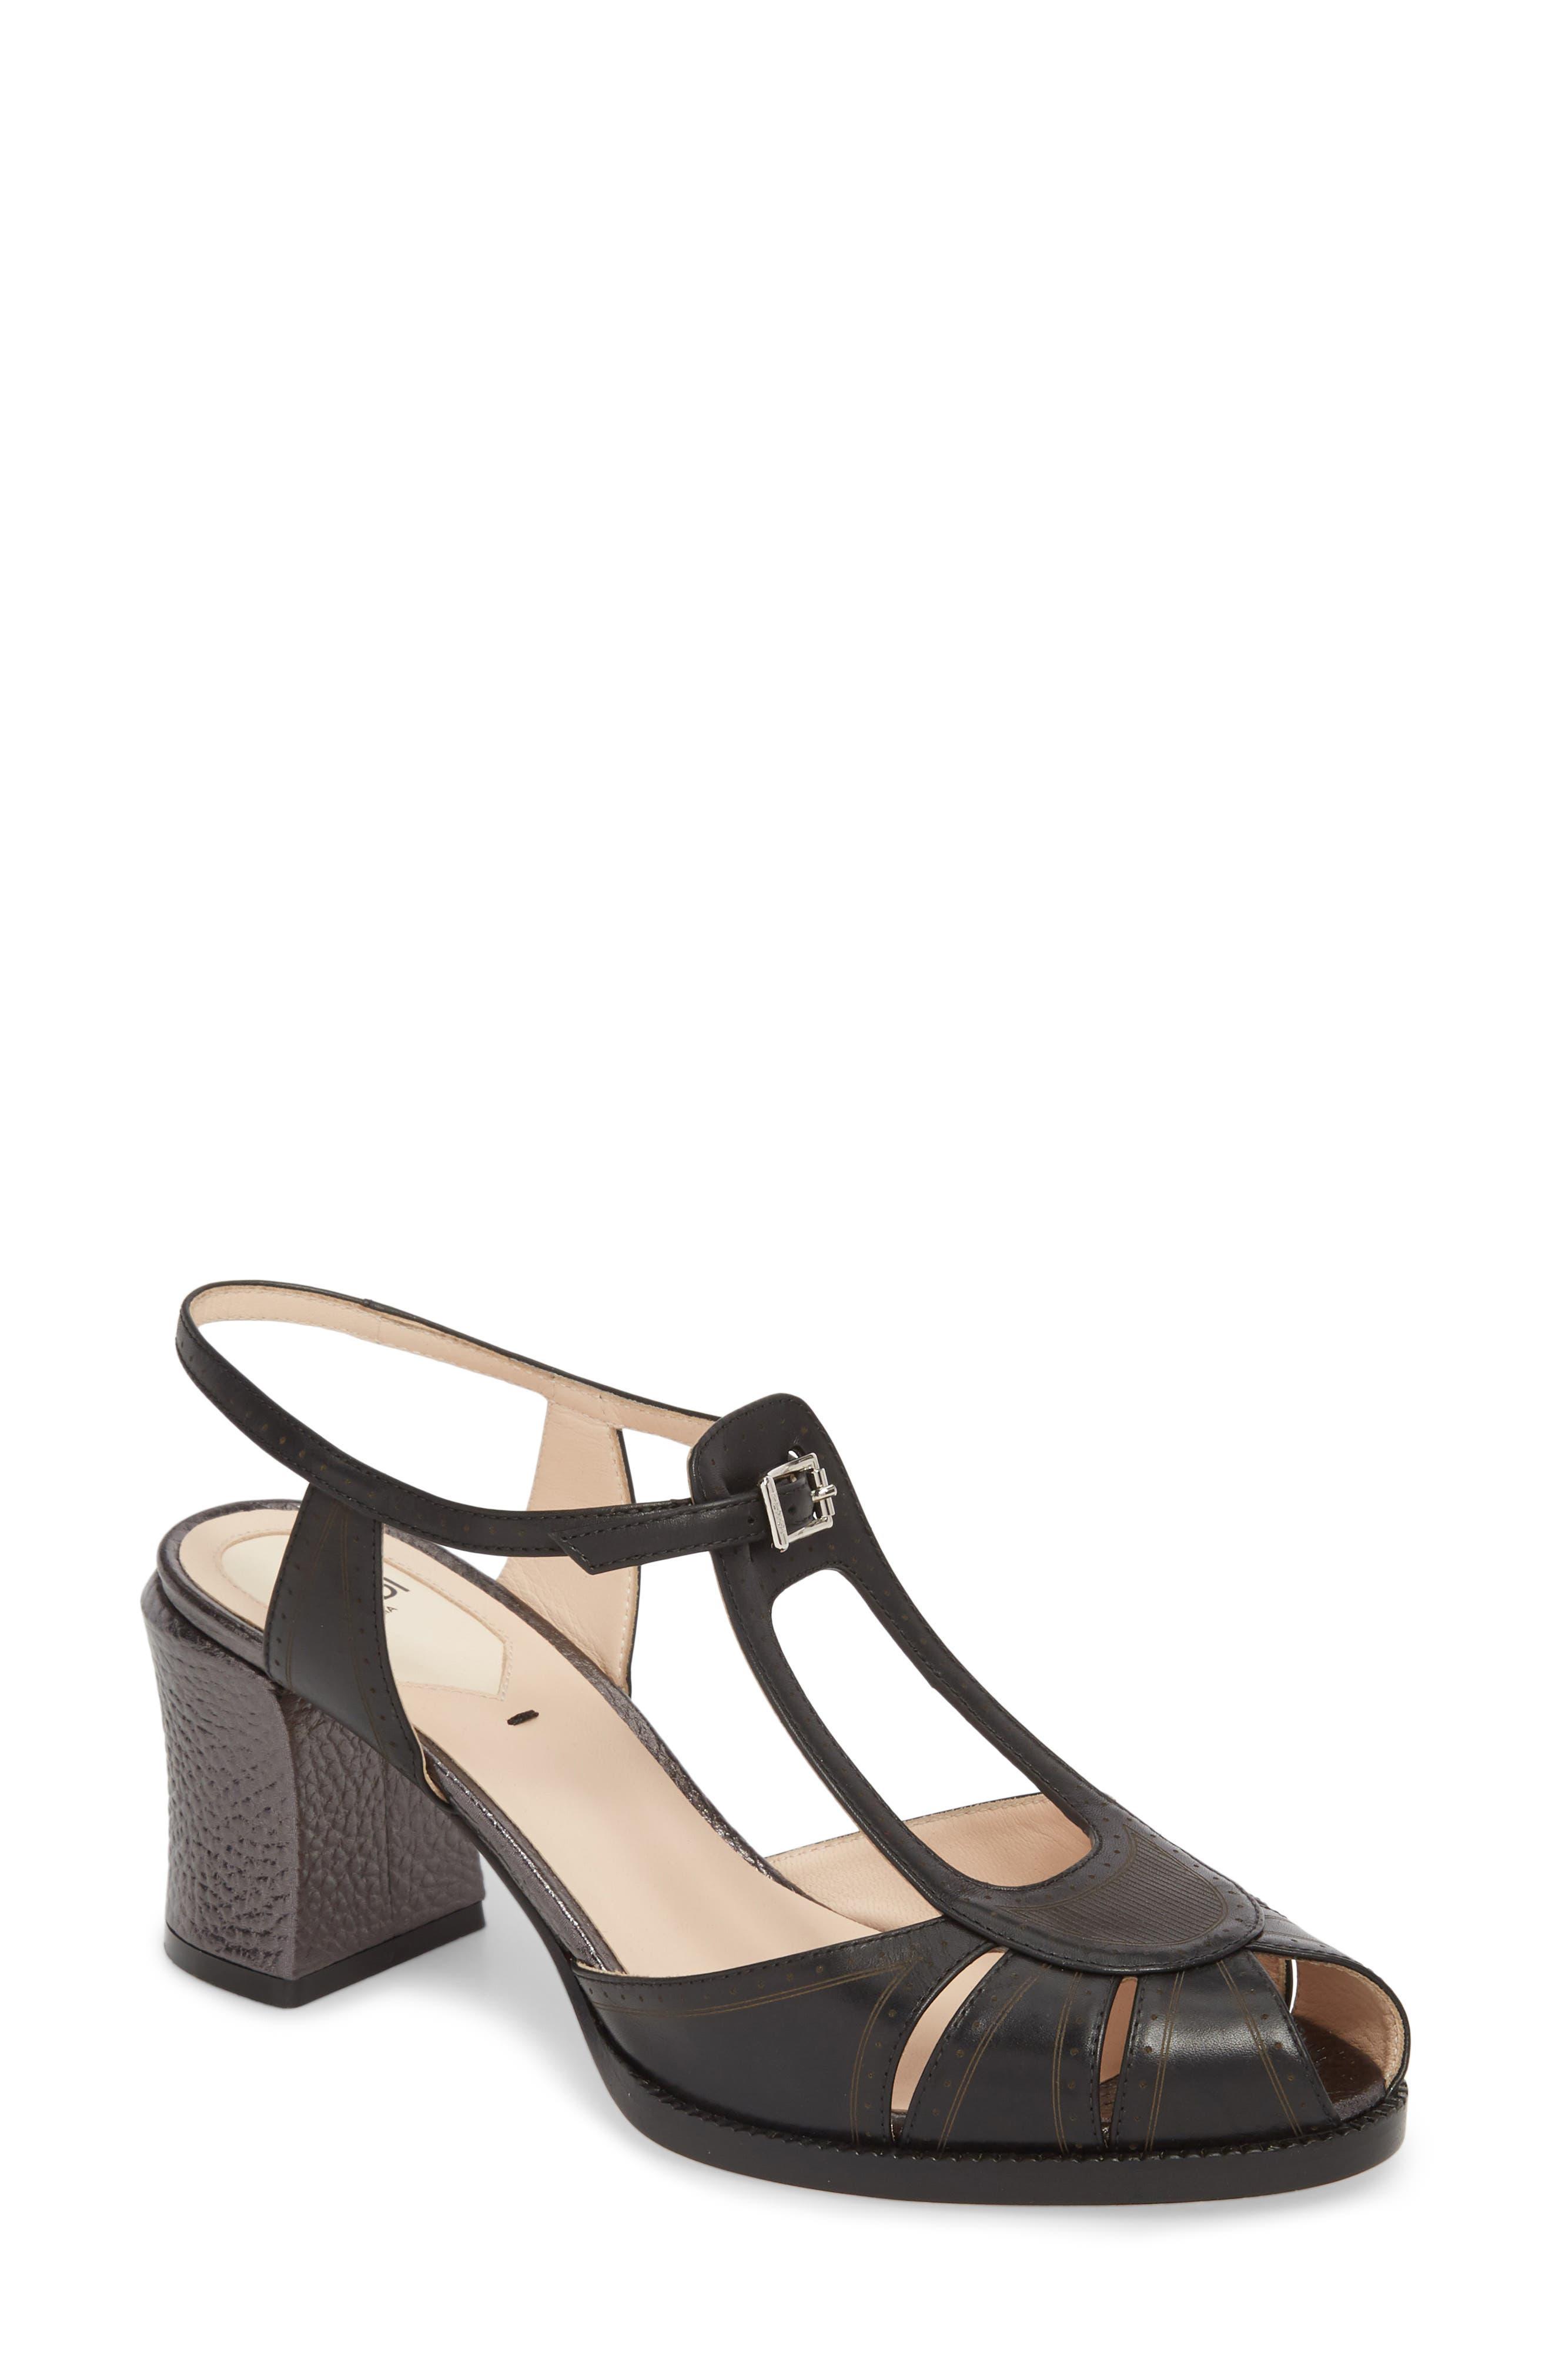 Chameleon Block Heel Sandal,                         Main,                         color, 019